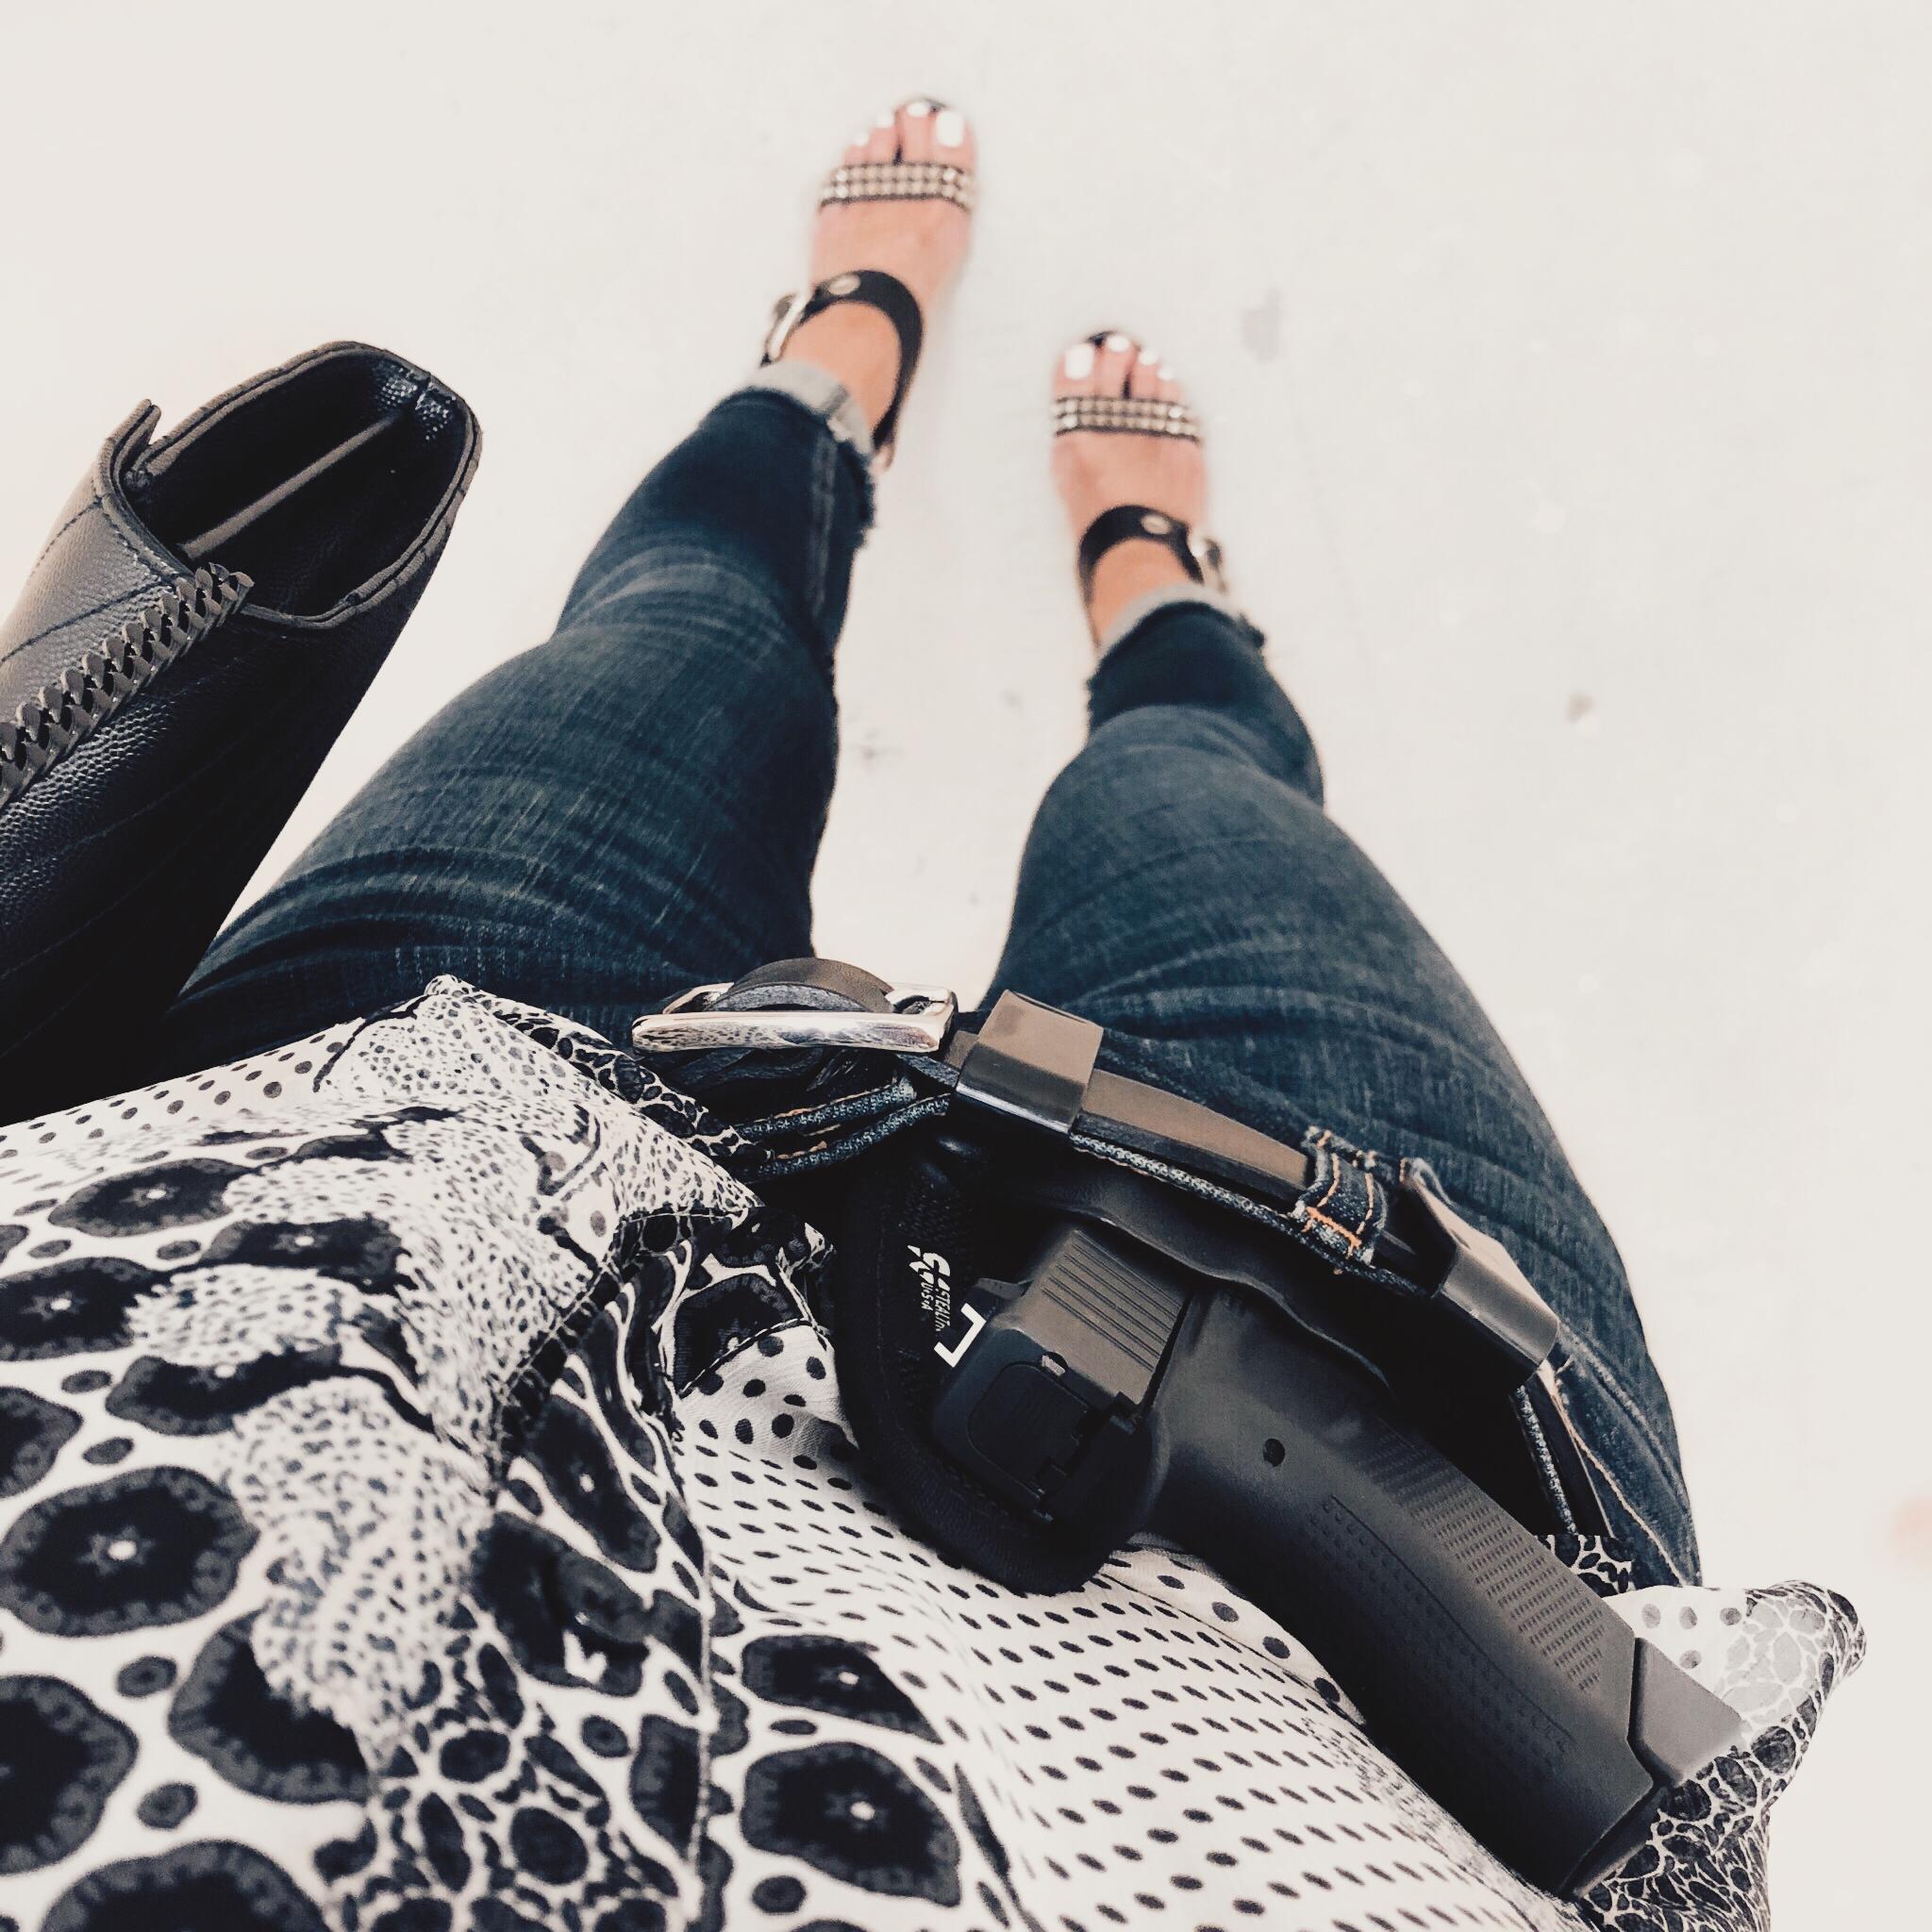 Glock 43   |   StealthGearUSA Appendix Ventcore Holster   |   Belt